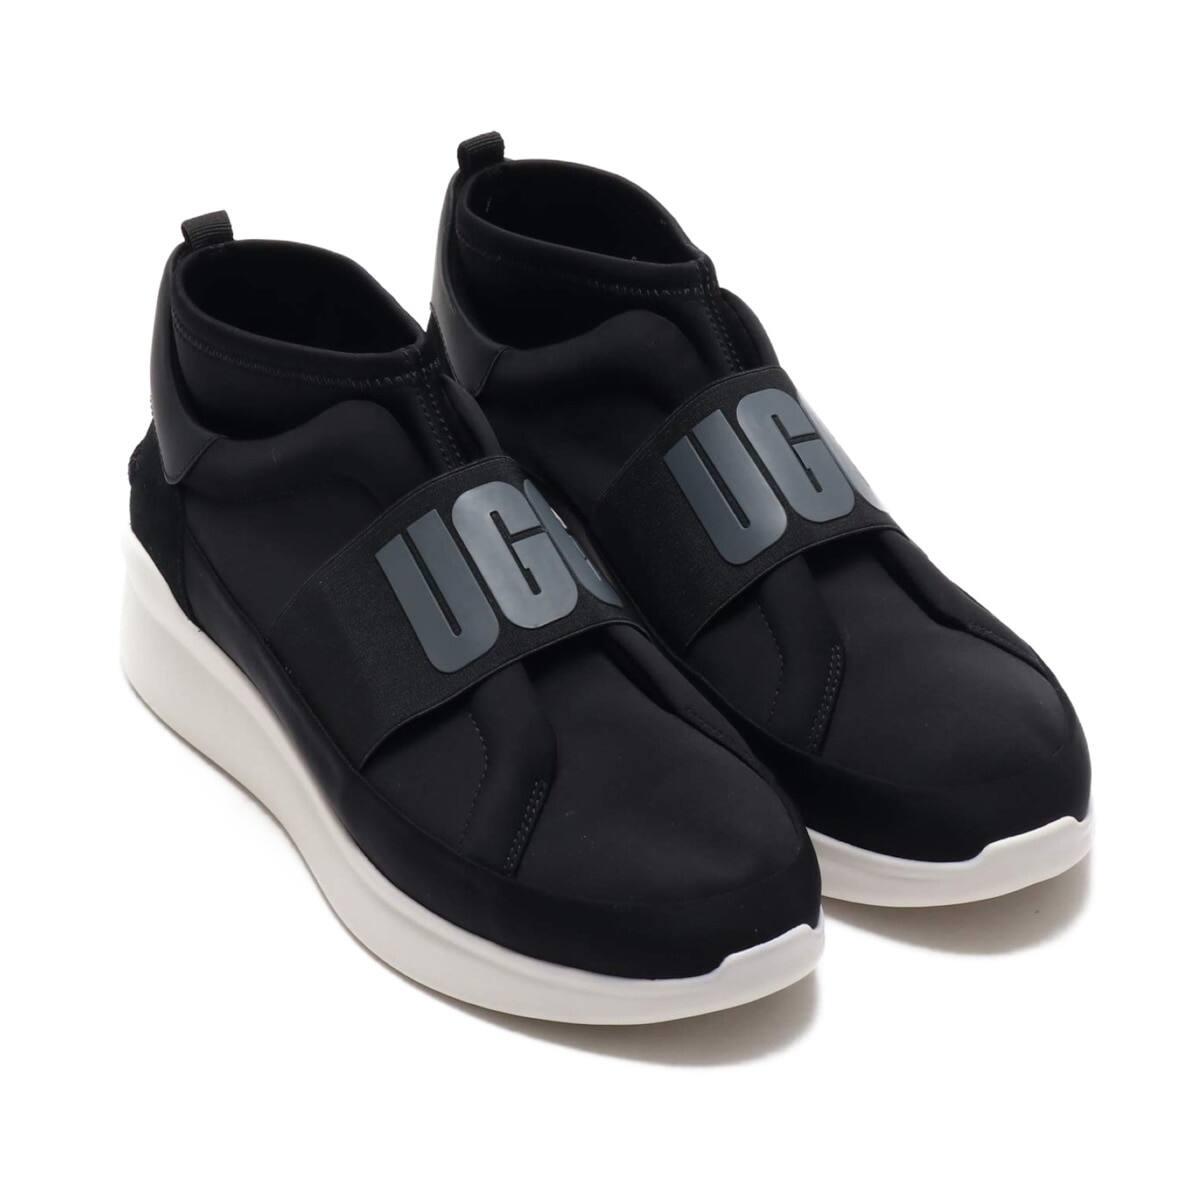 4edf231244f UGG Neutra Sneaker (アグ ニュートラ スニーカー)BLACK【レディース ...